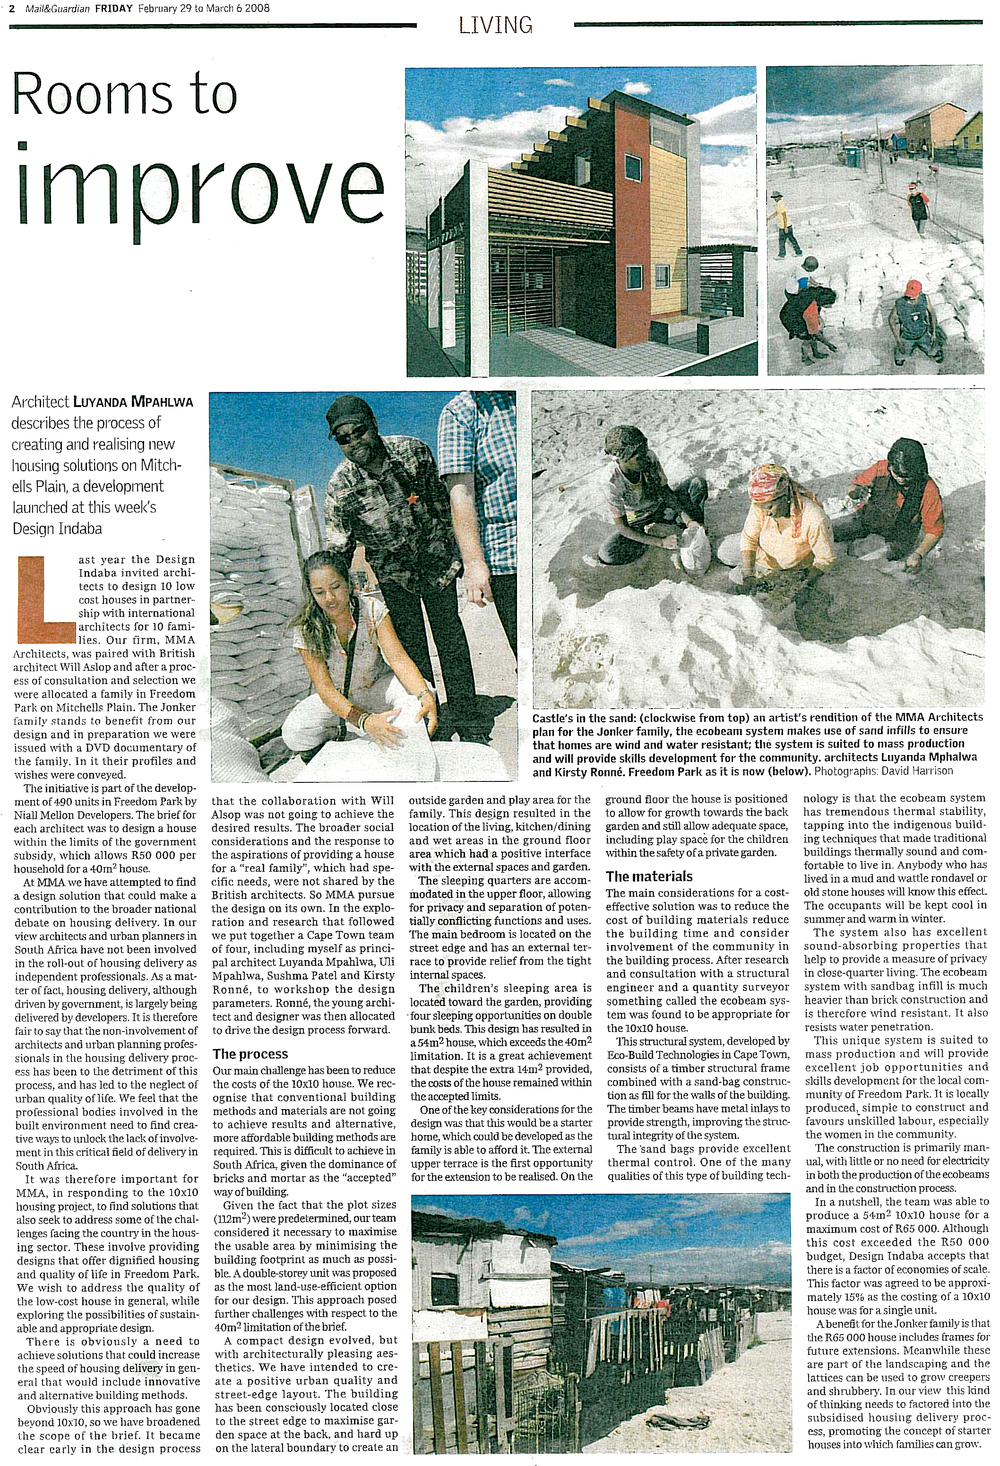 2008 Mail&Guardian.jpg